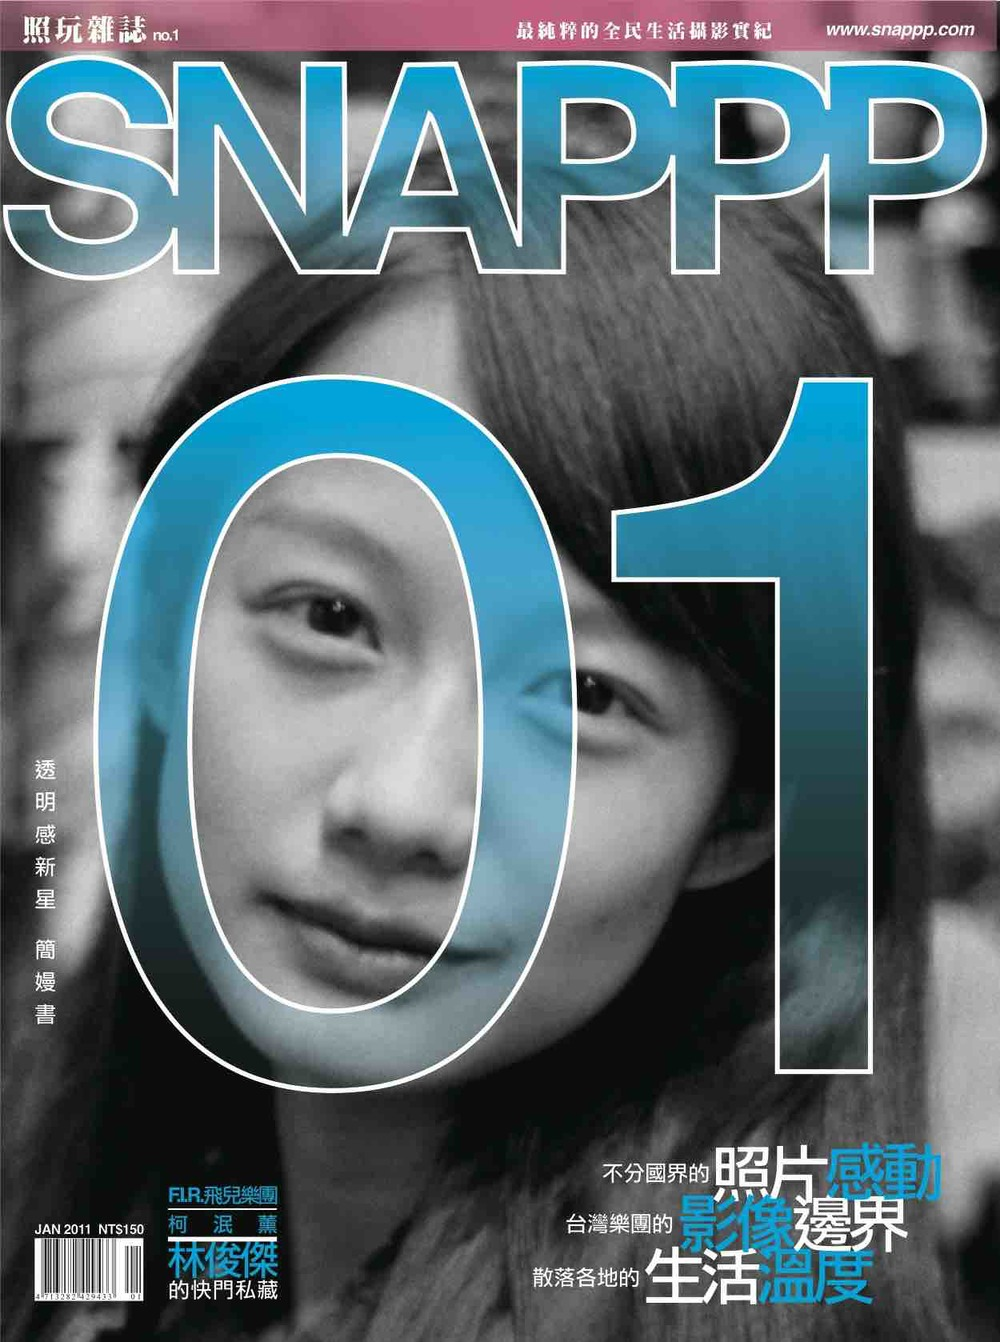 SNAPPP-NO01.jpg